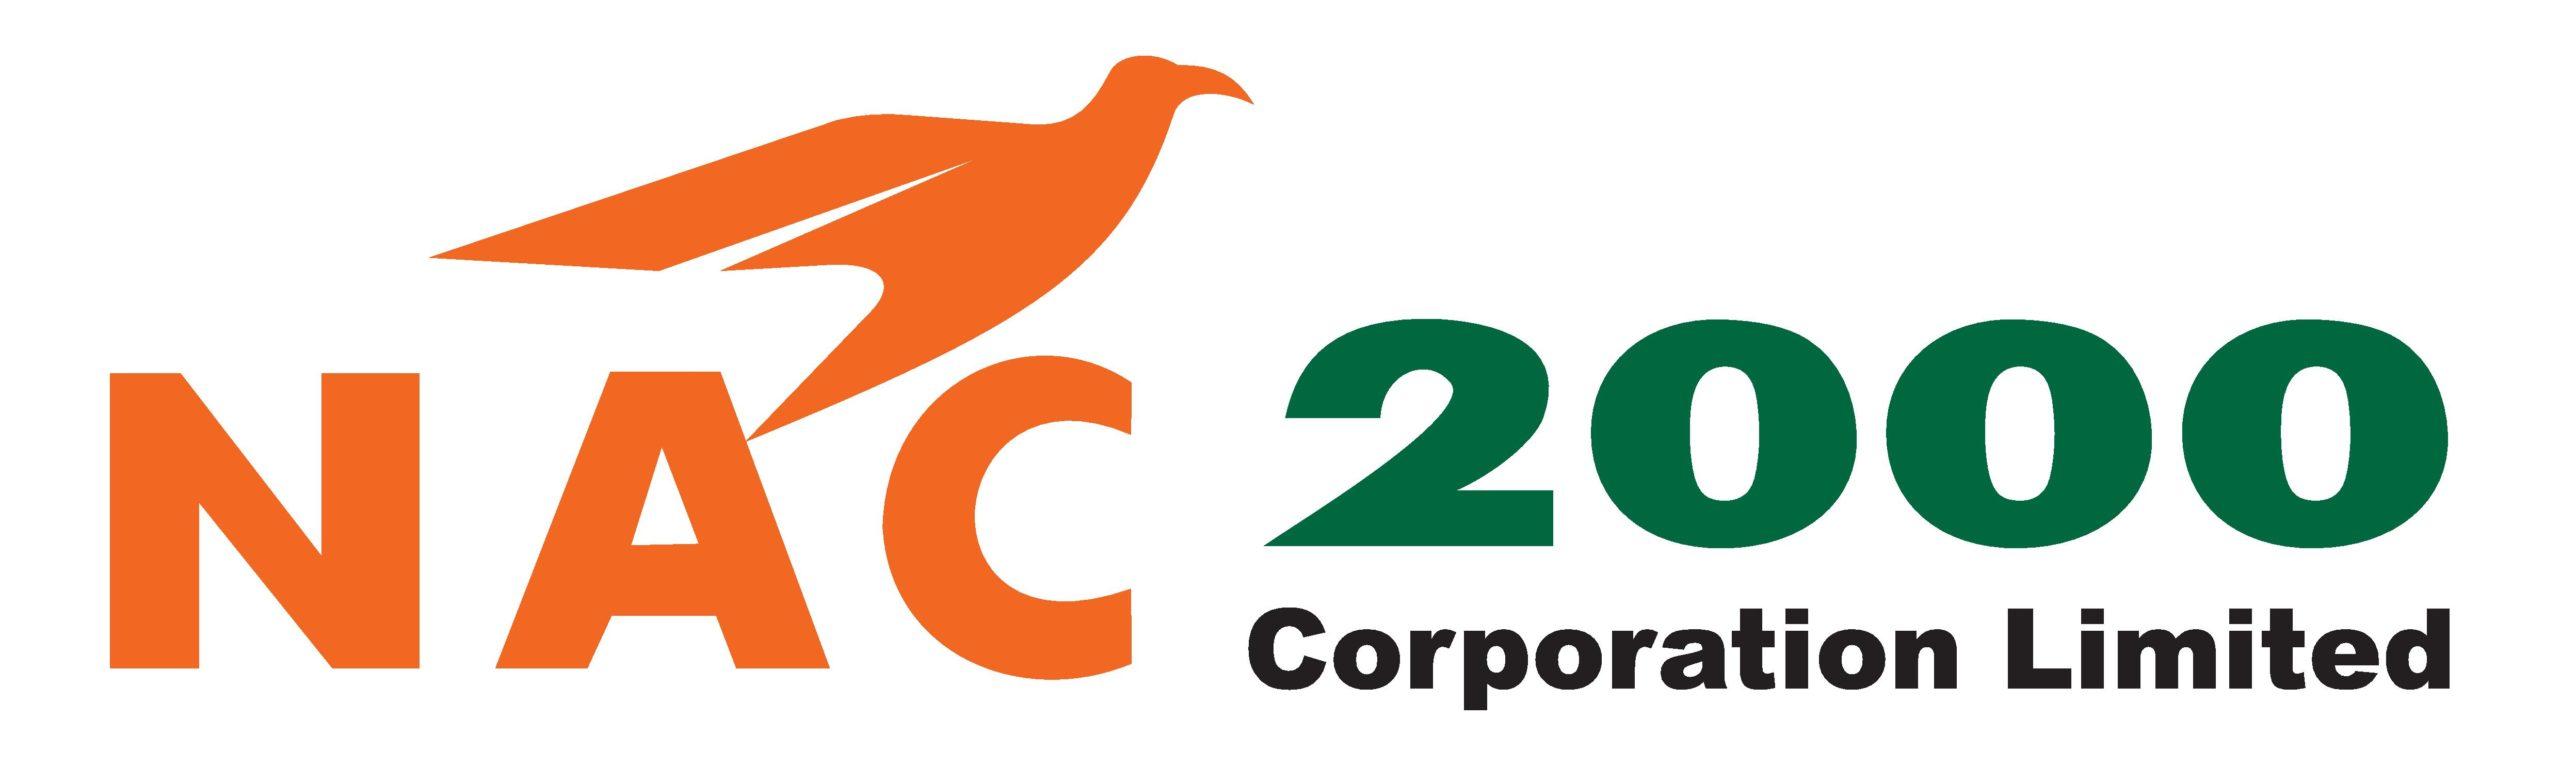 NAC 2000 Logo Jpeg White Background